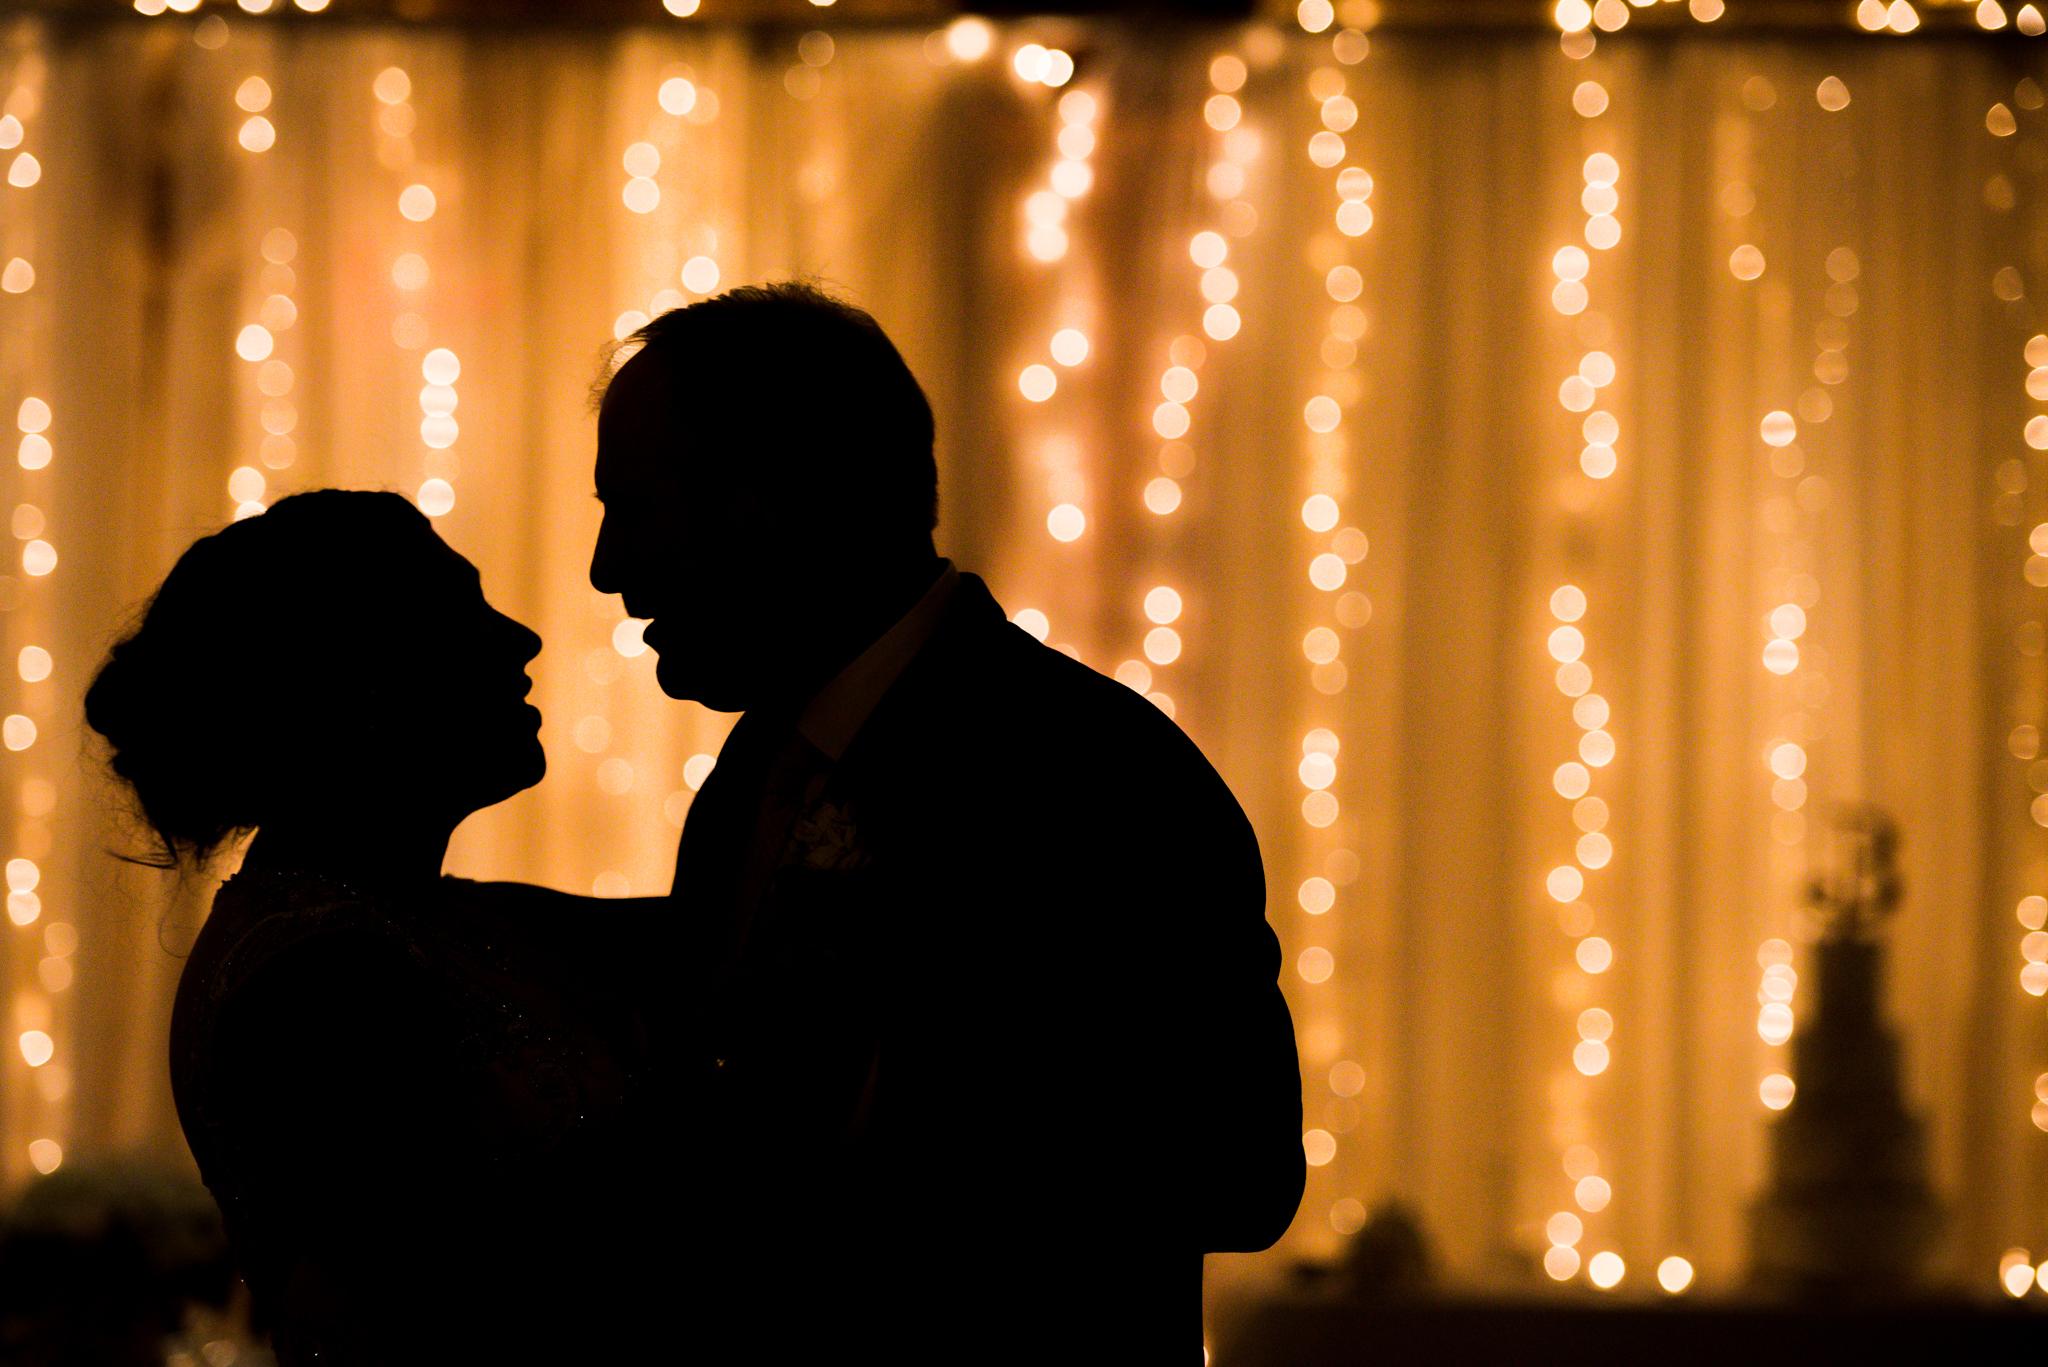 radisson-wedding-photographer-scranton-steven-serge-photography-1.jpg